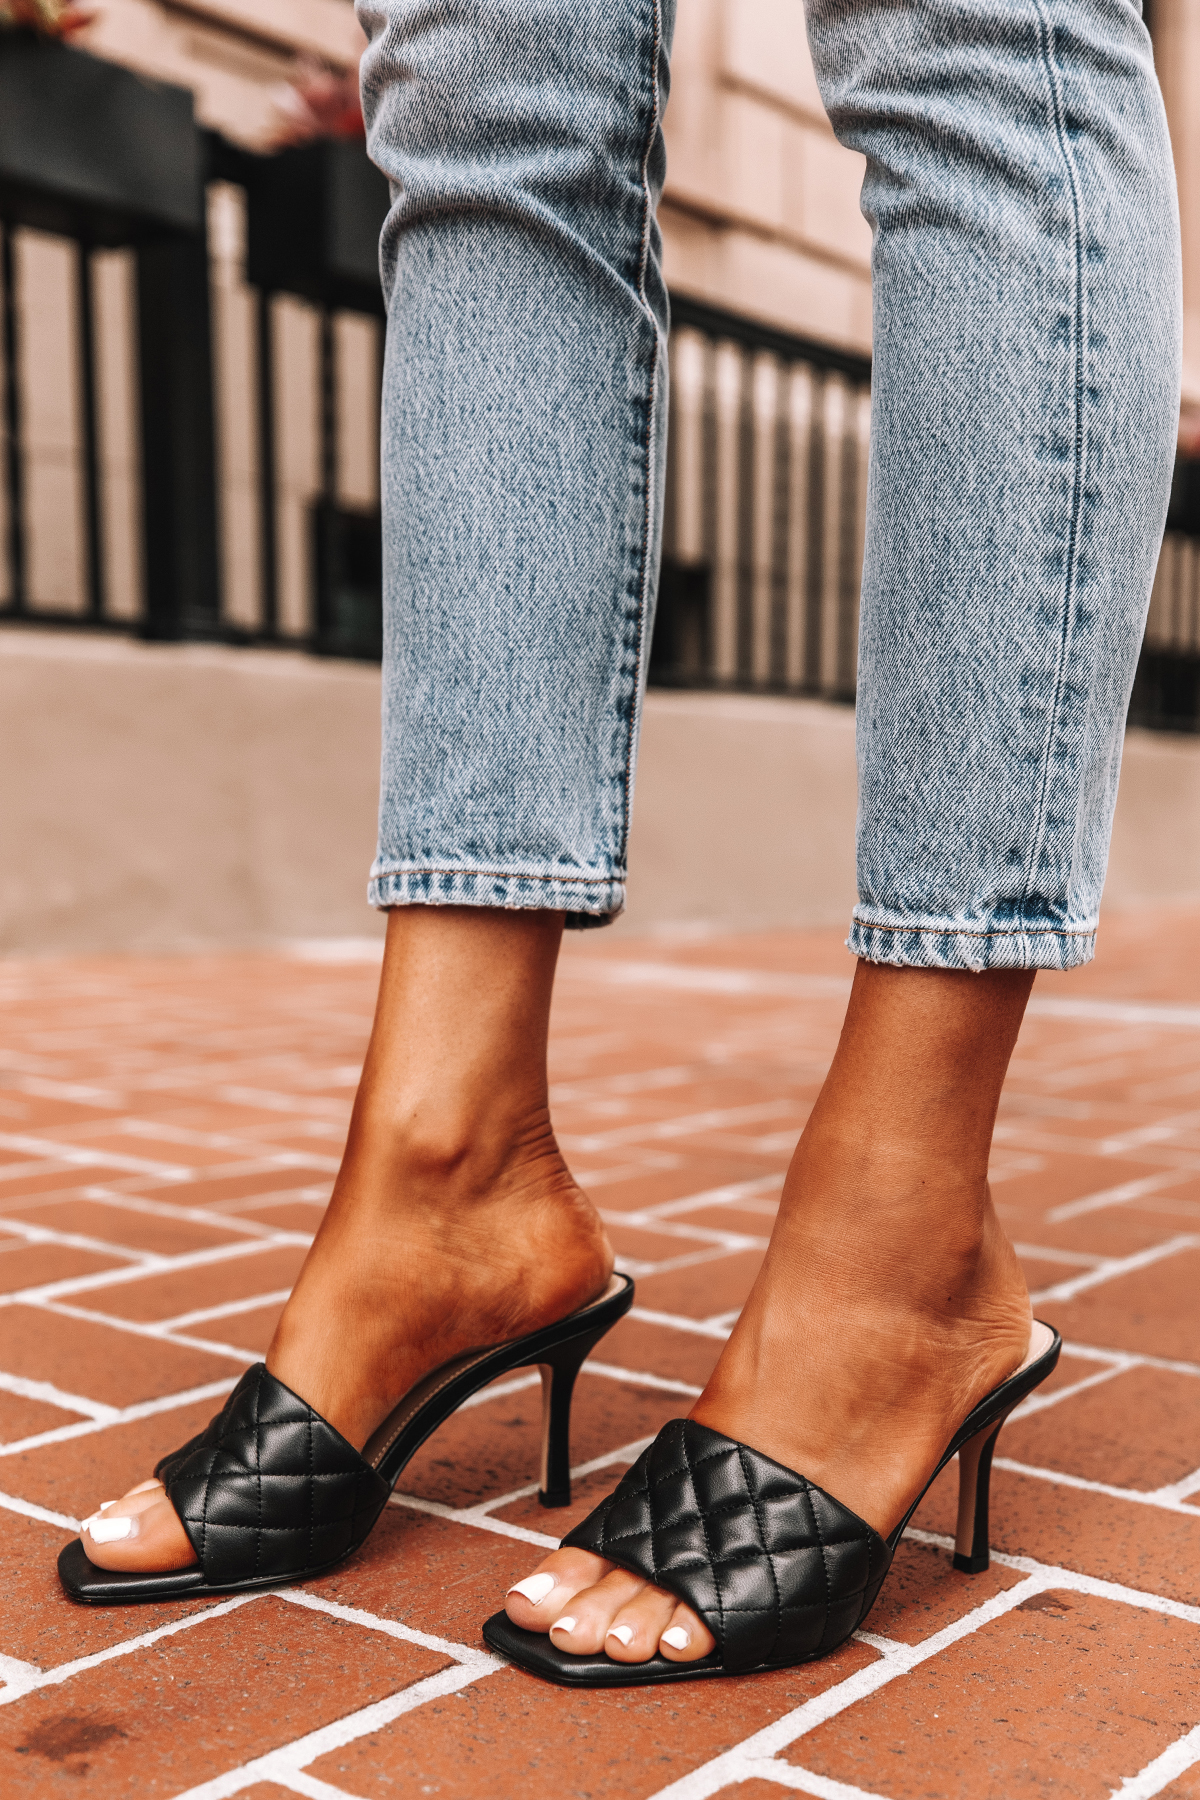 Fashion Jackson Wearing Villa Rouge Black Viva Mules Quilted Heeled Sandals